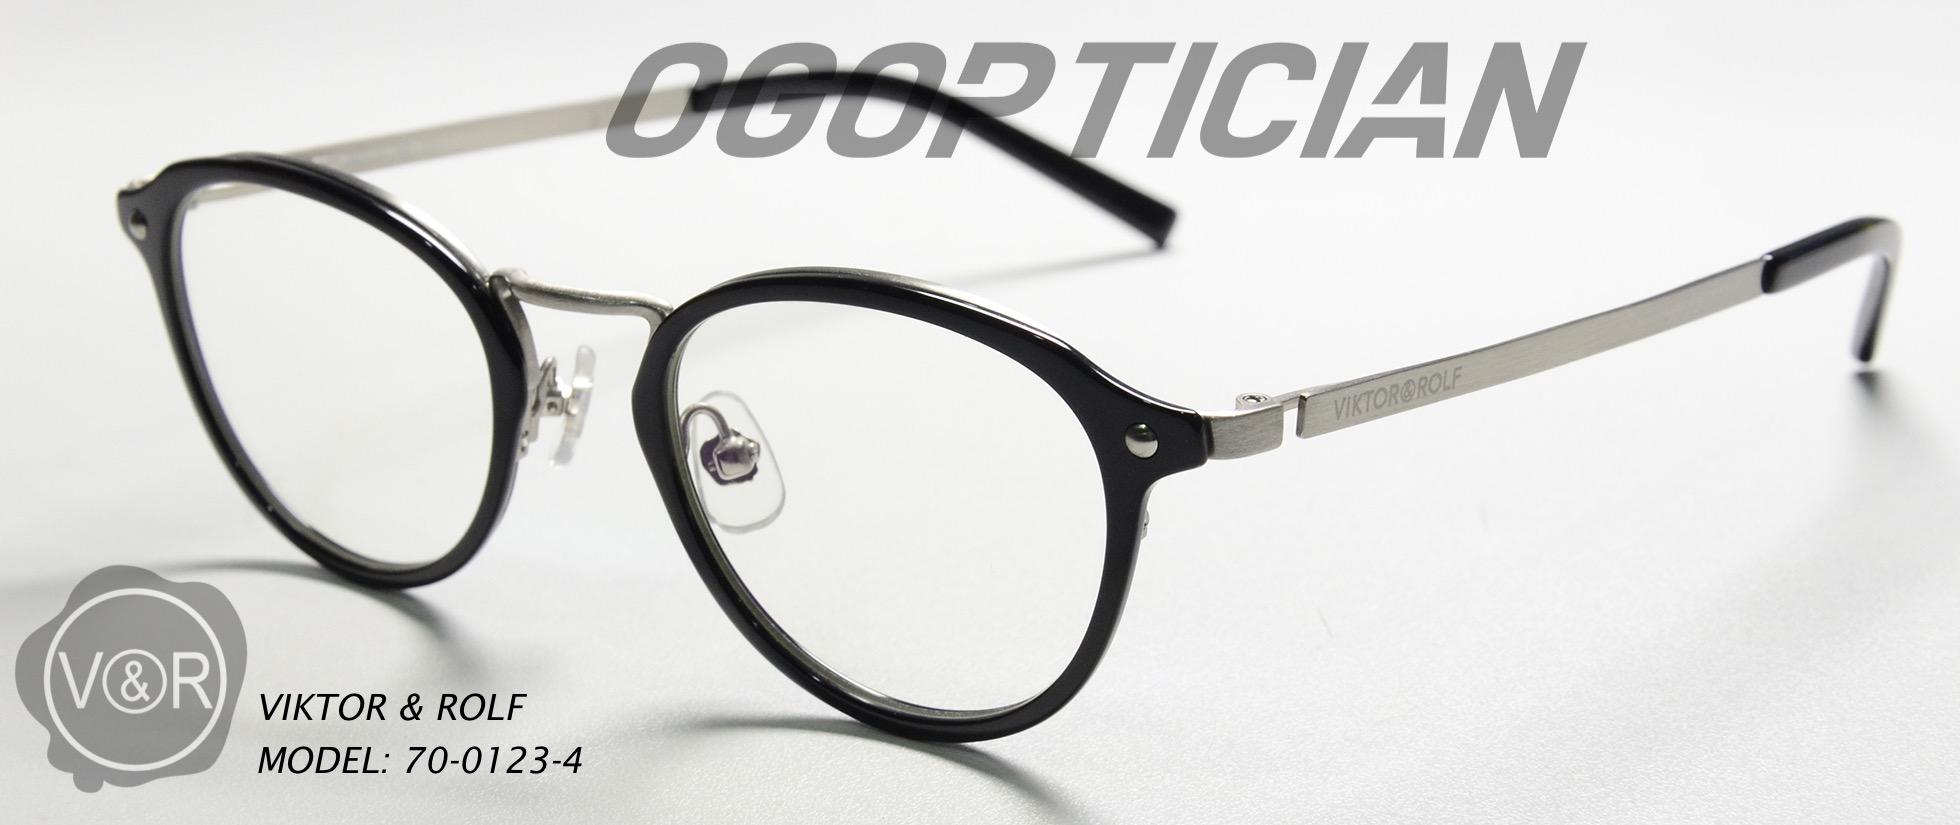 VIKTORANDROLF 70-0123-4